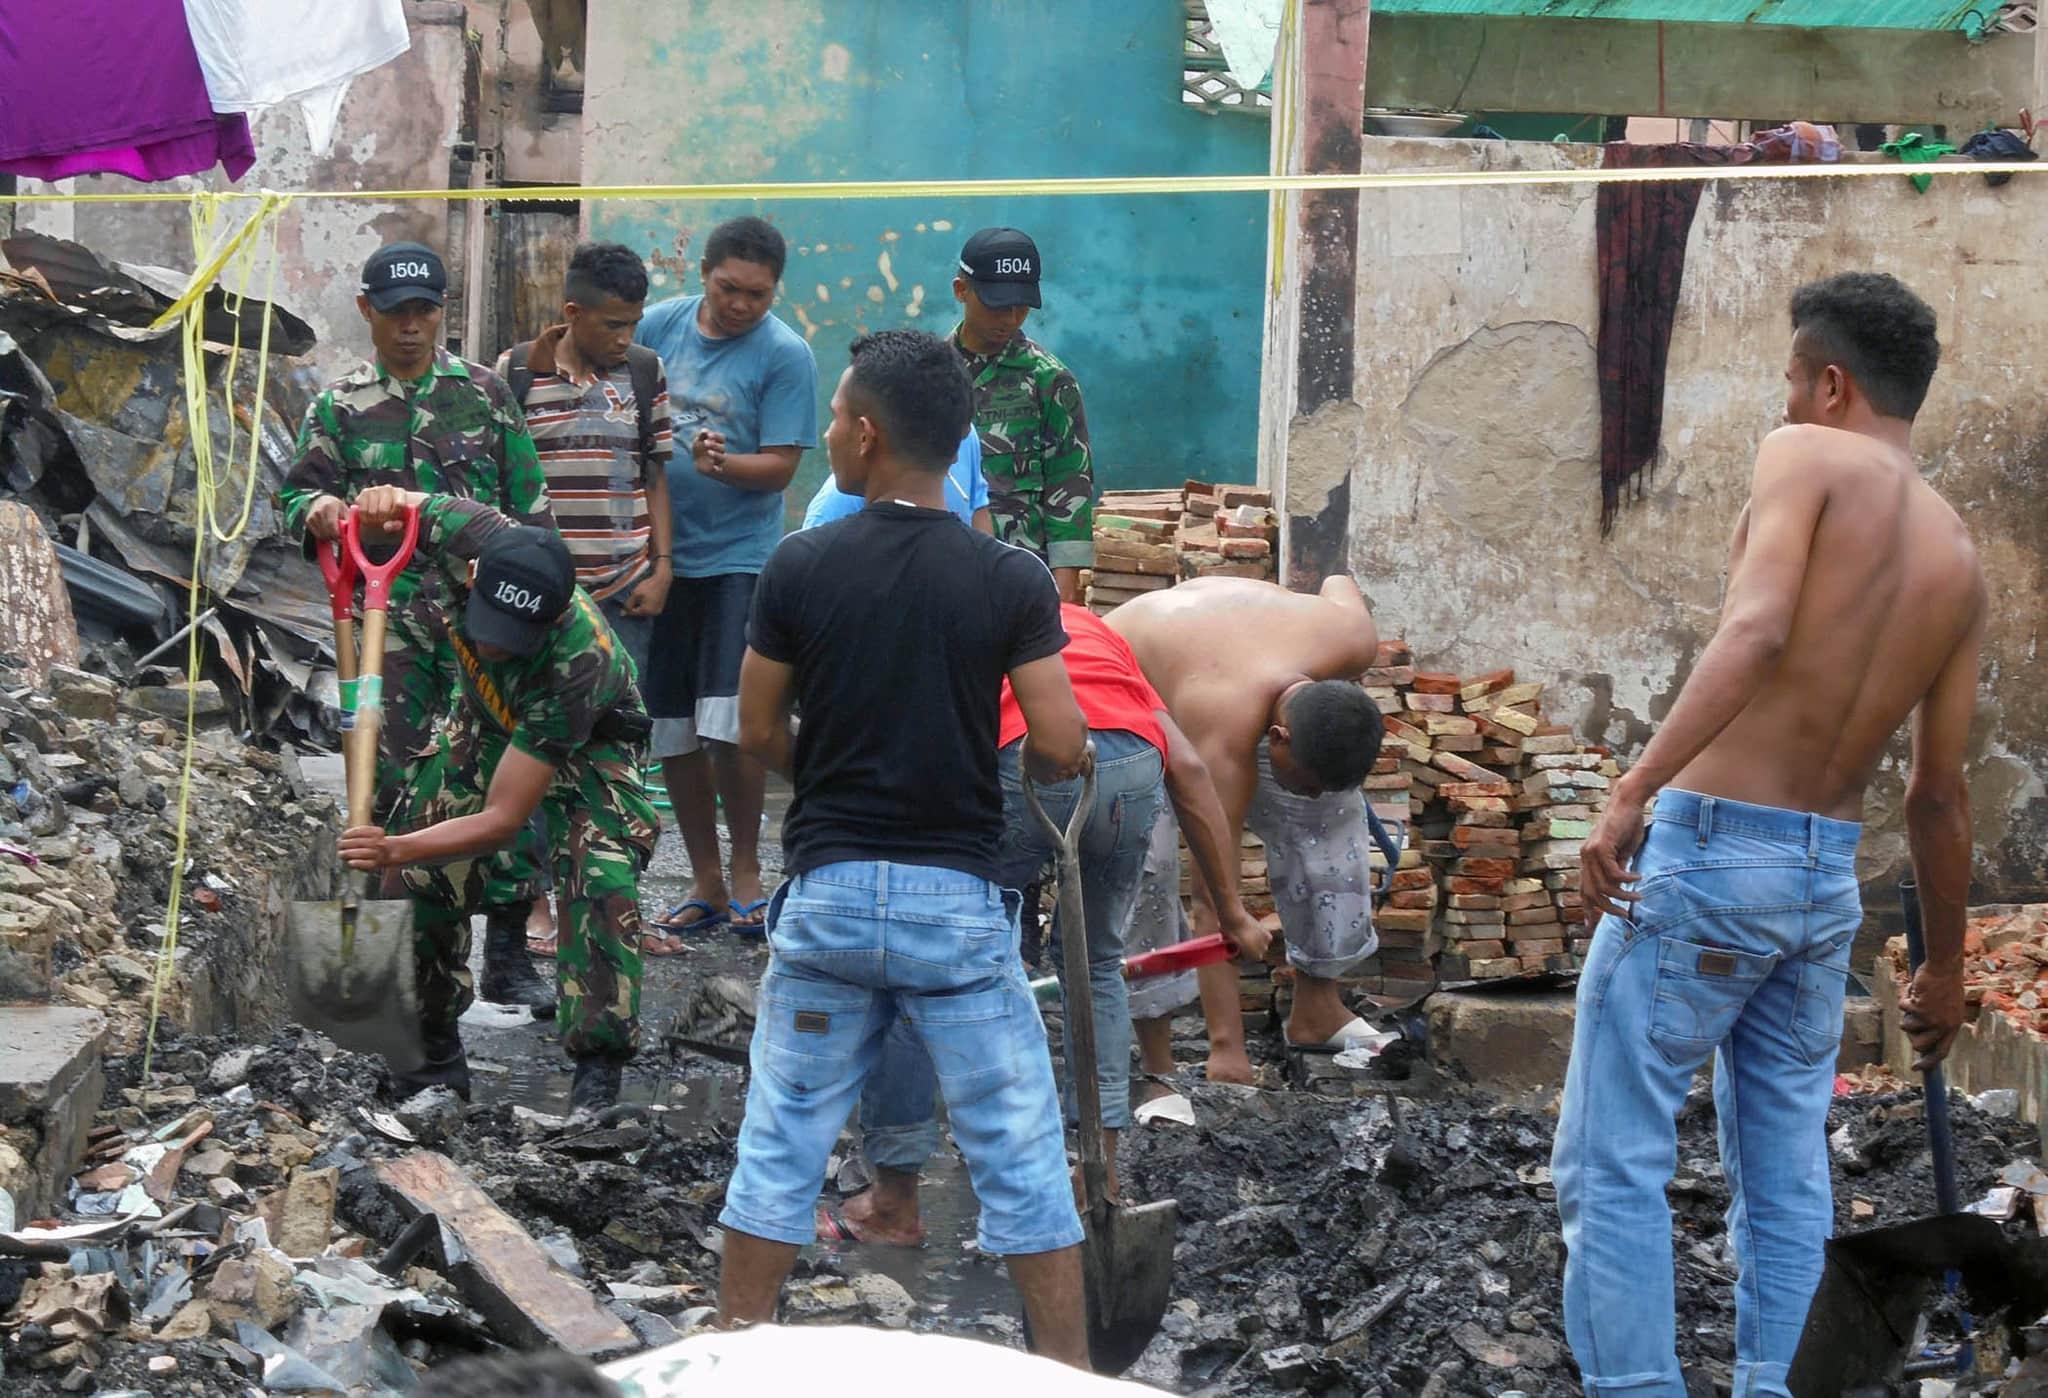 Kodim Ambon Gelar Karya Bakti di Lokasi Kebakaran Jl. Baru Kota Ambon